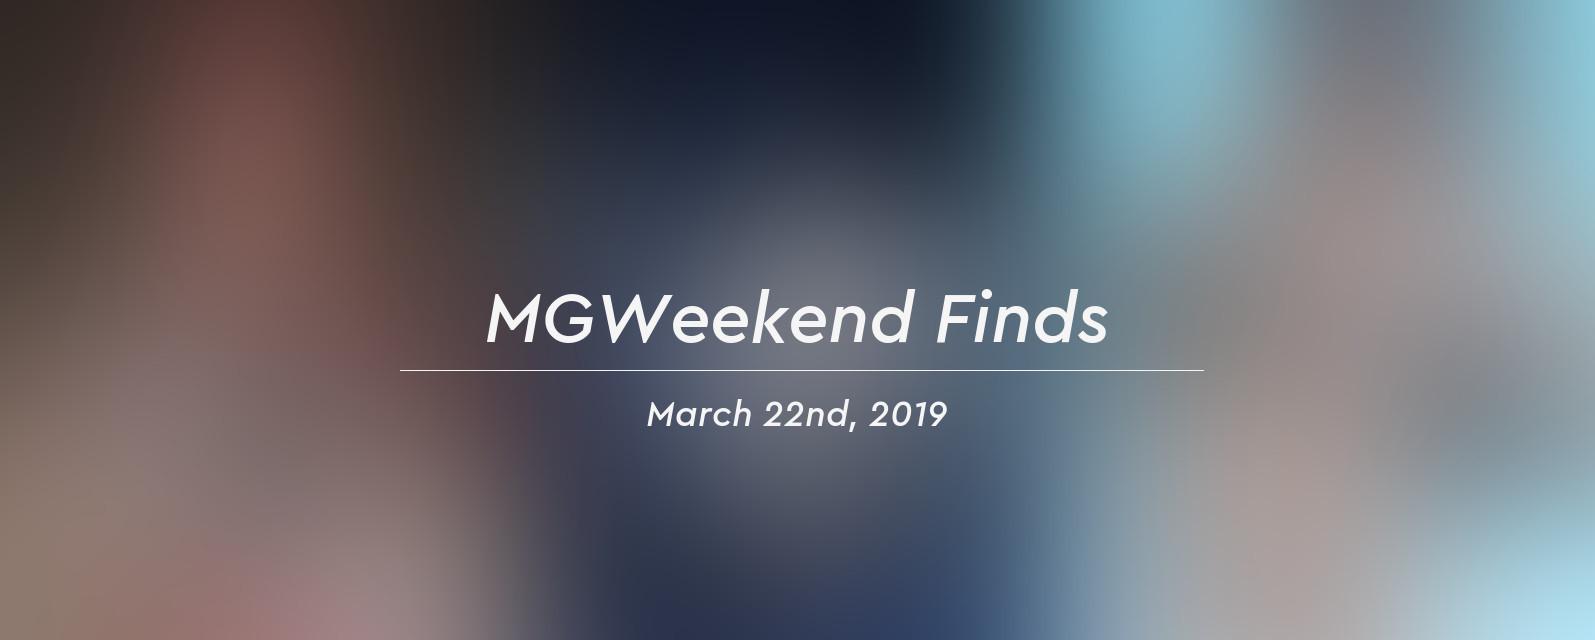 mgw finds 2019 03 22 header